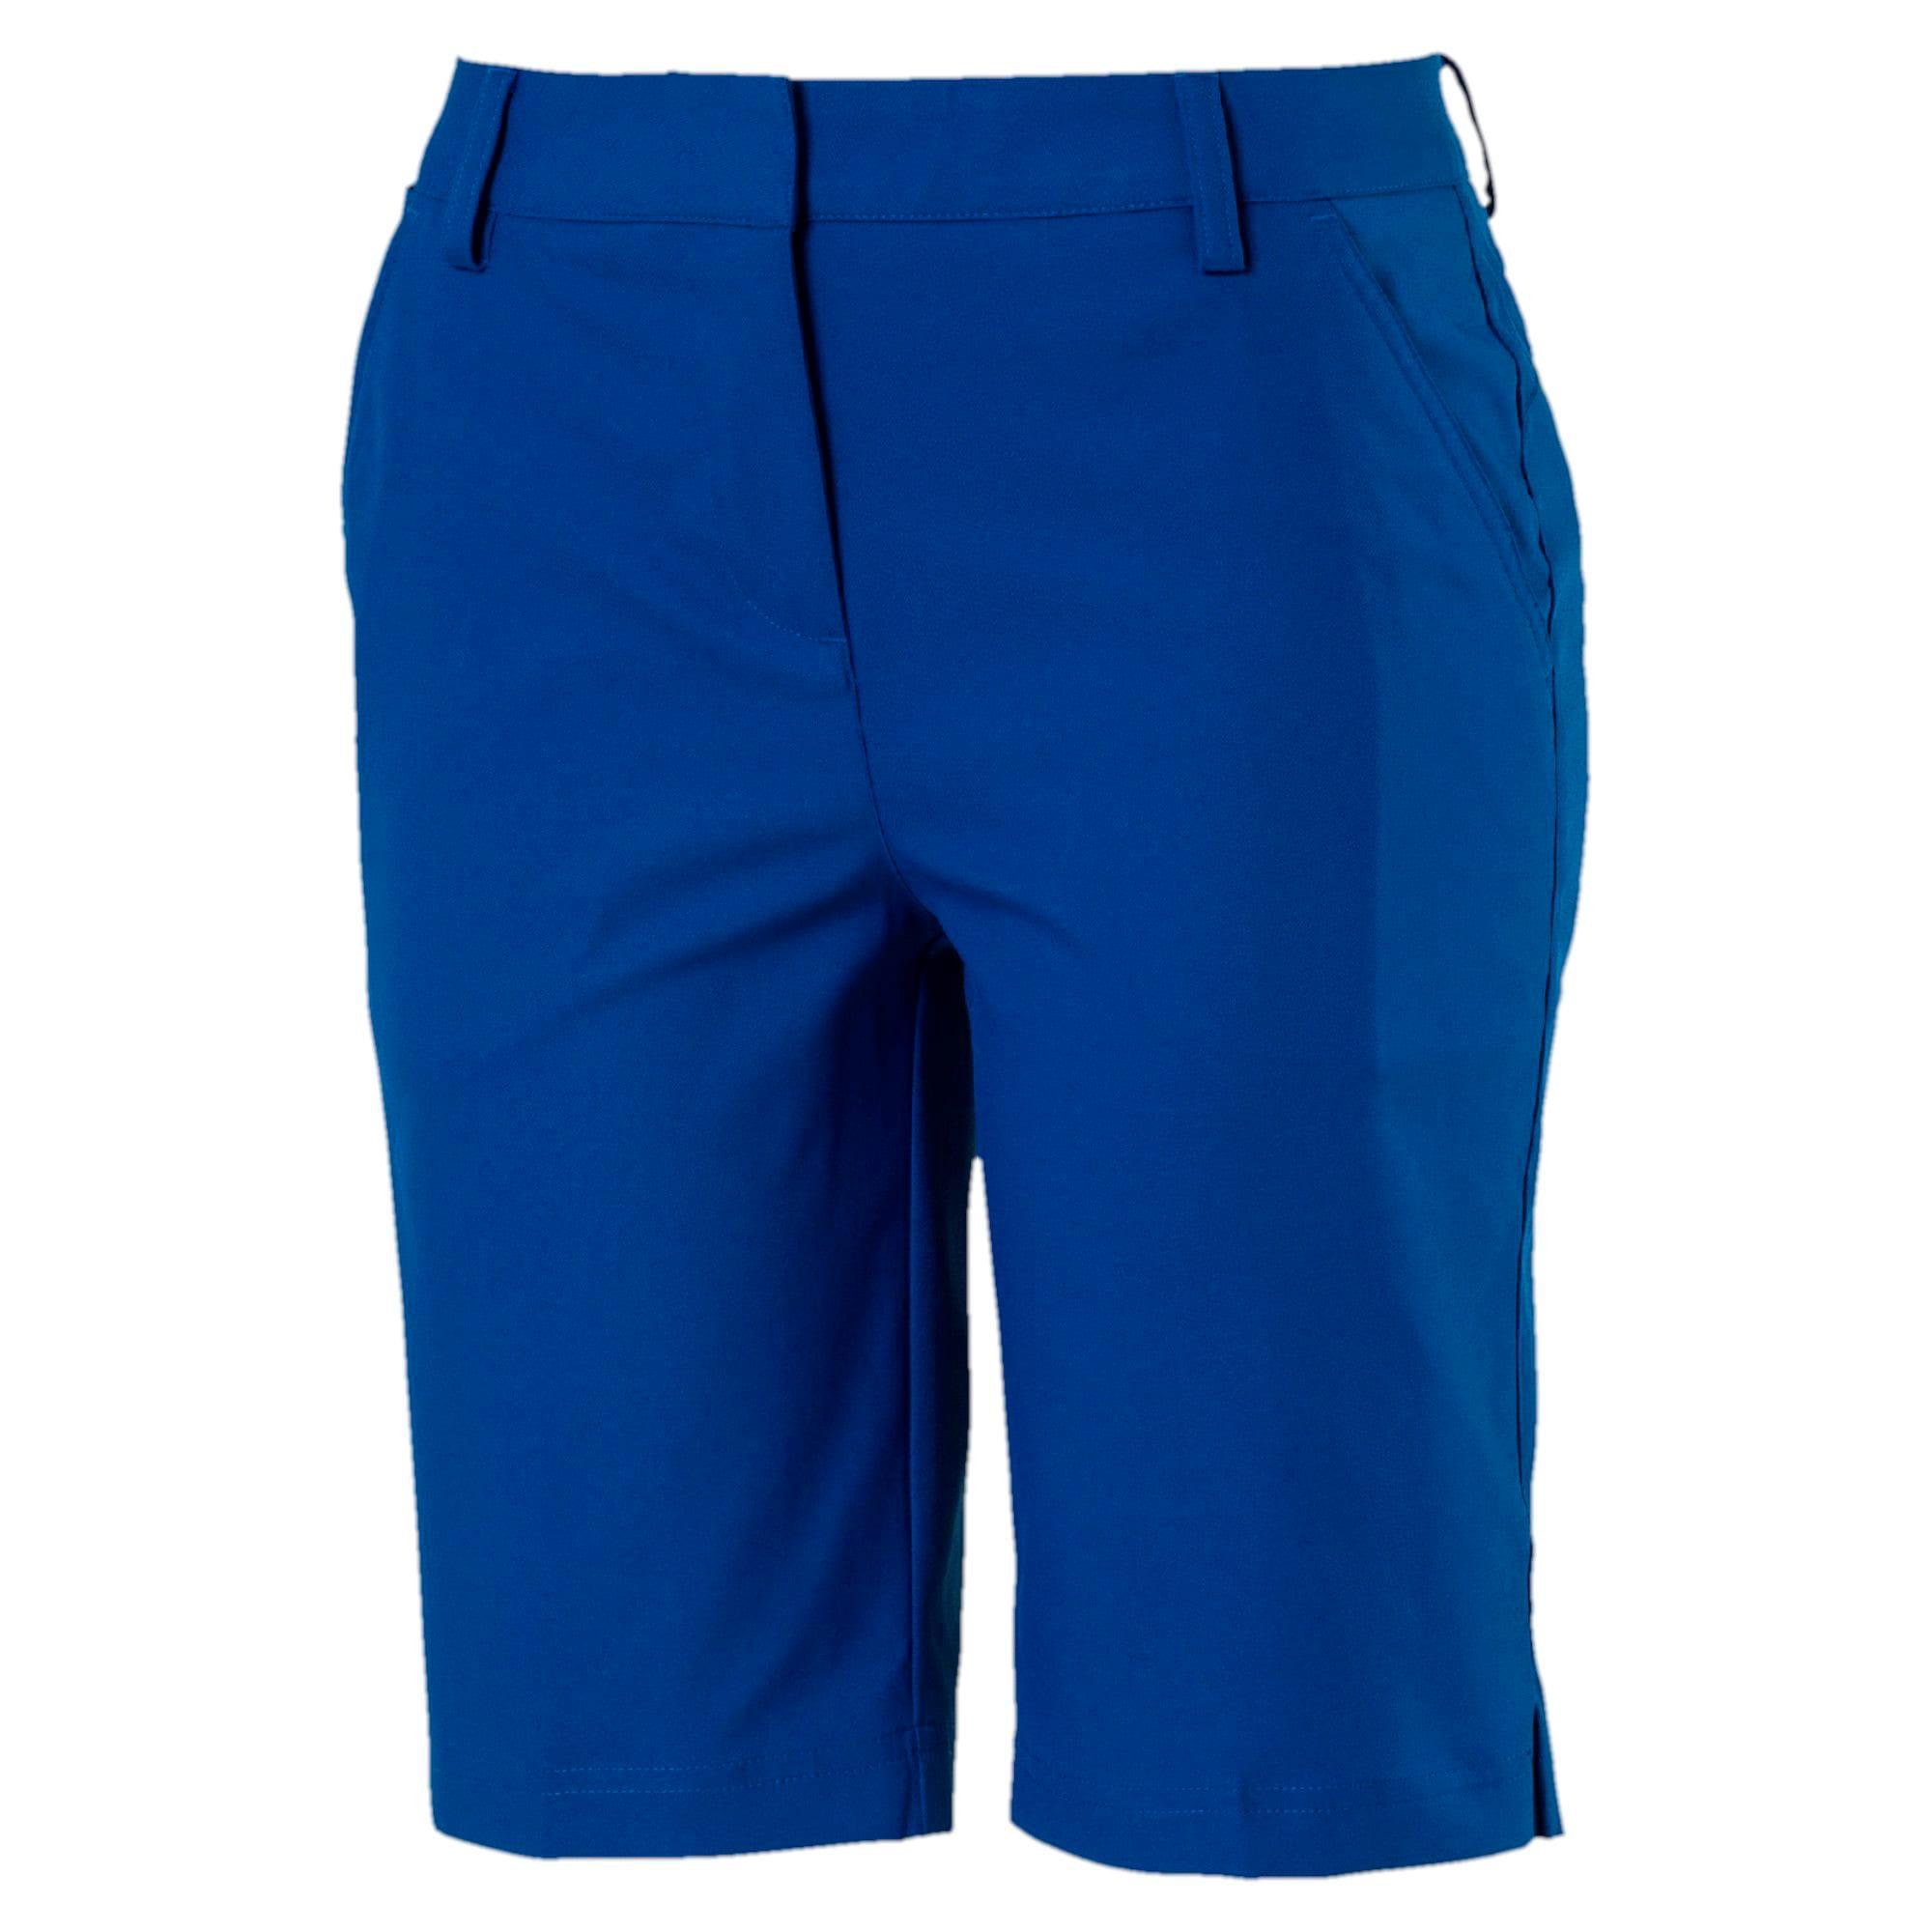 Thumbnail 1 of Pounce Bermuda Shorts, TRUE BLUE, medium